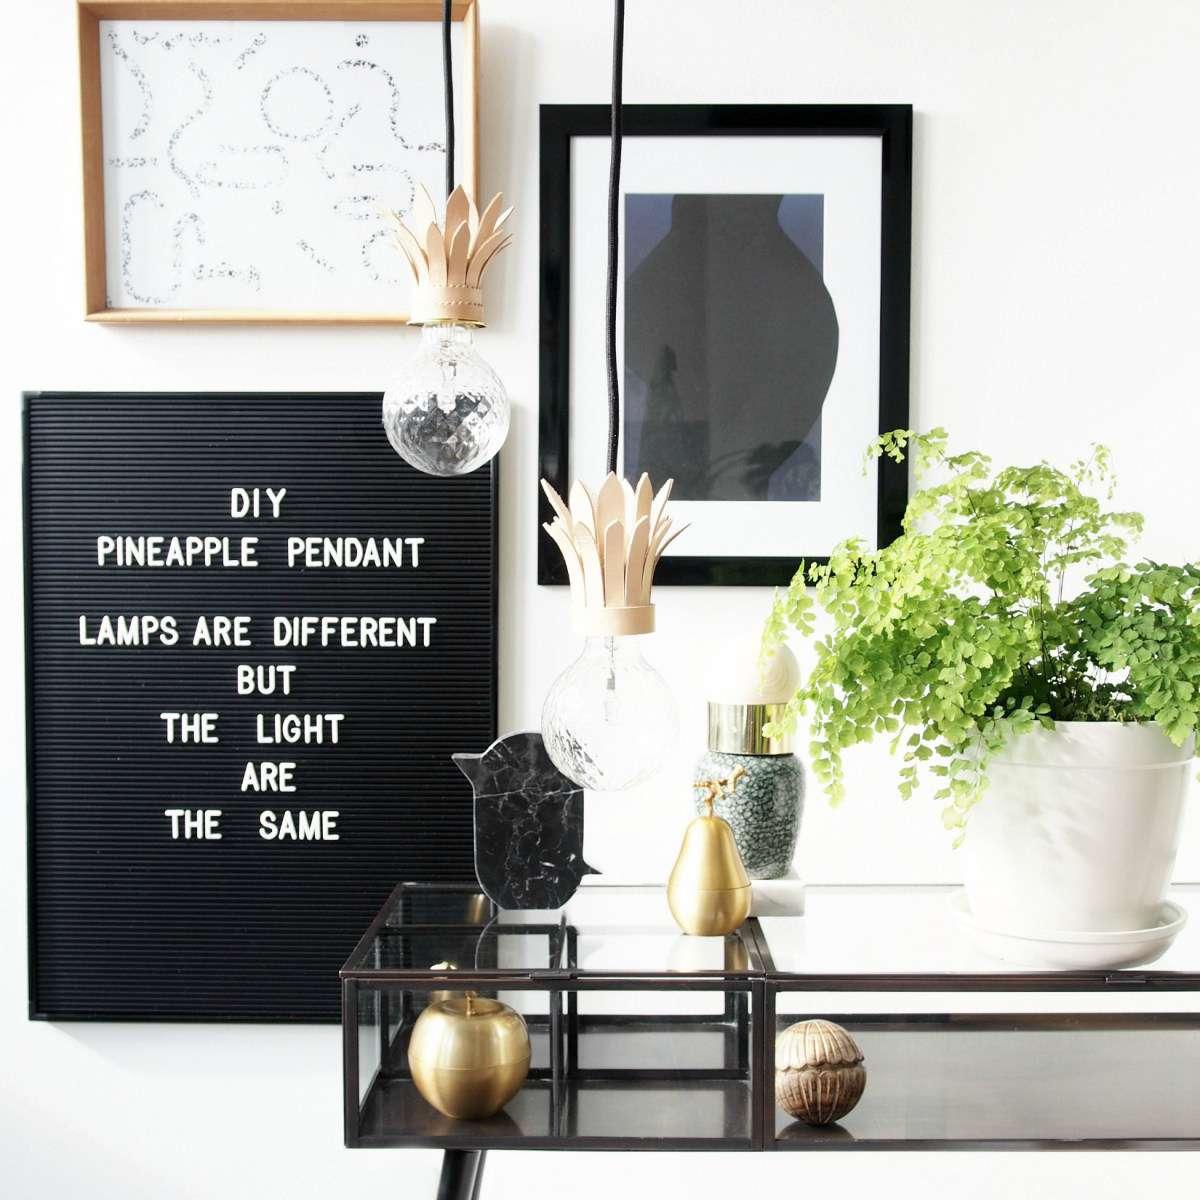 DIY Pineapple Pendant Light